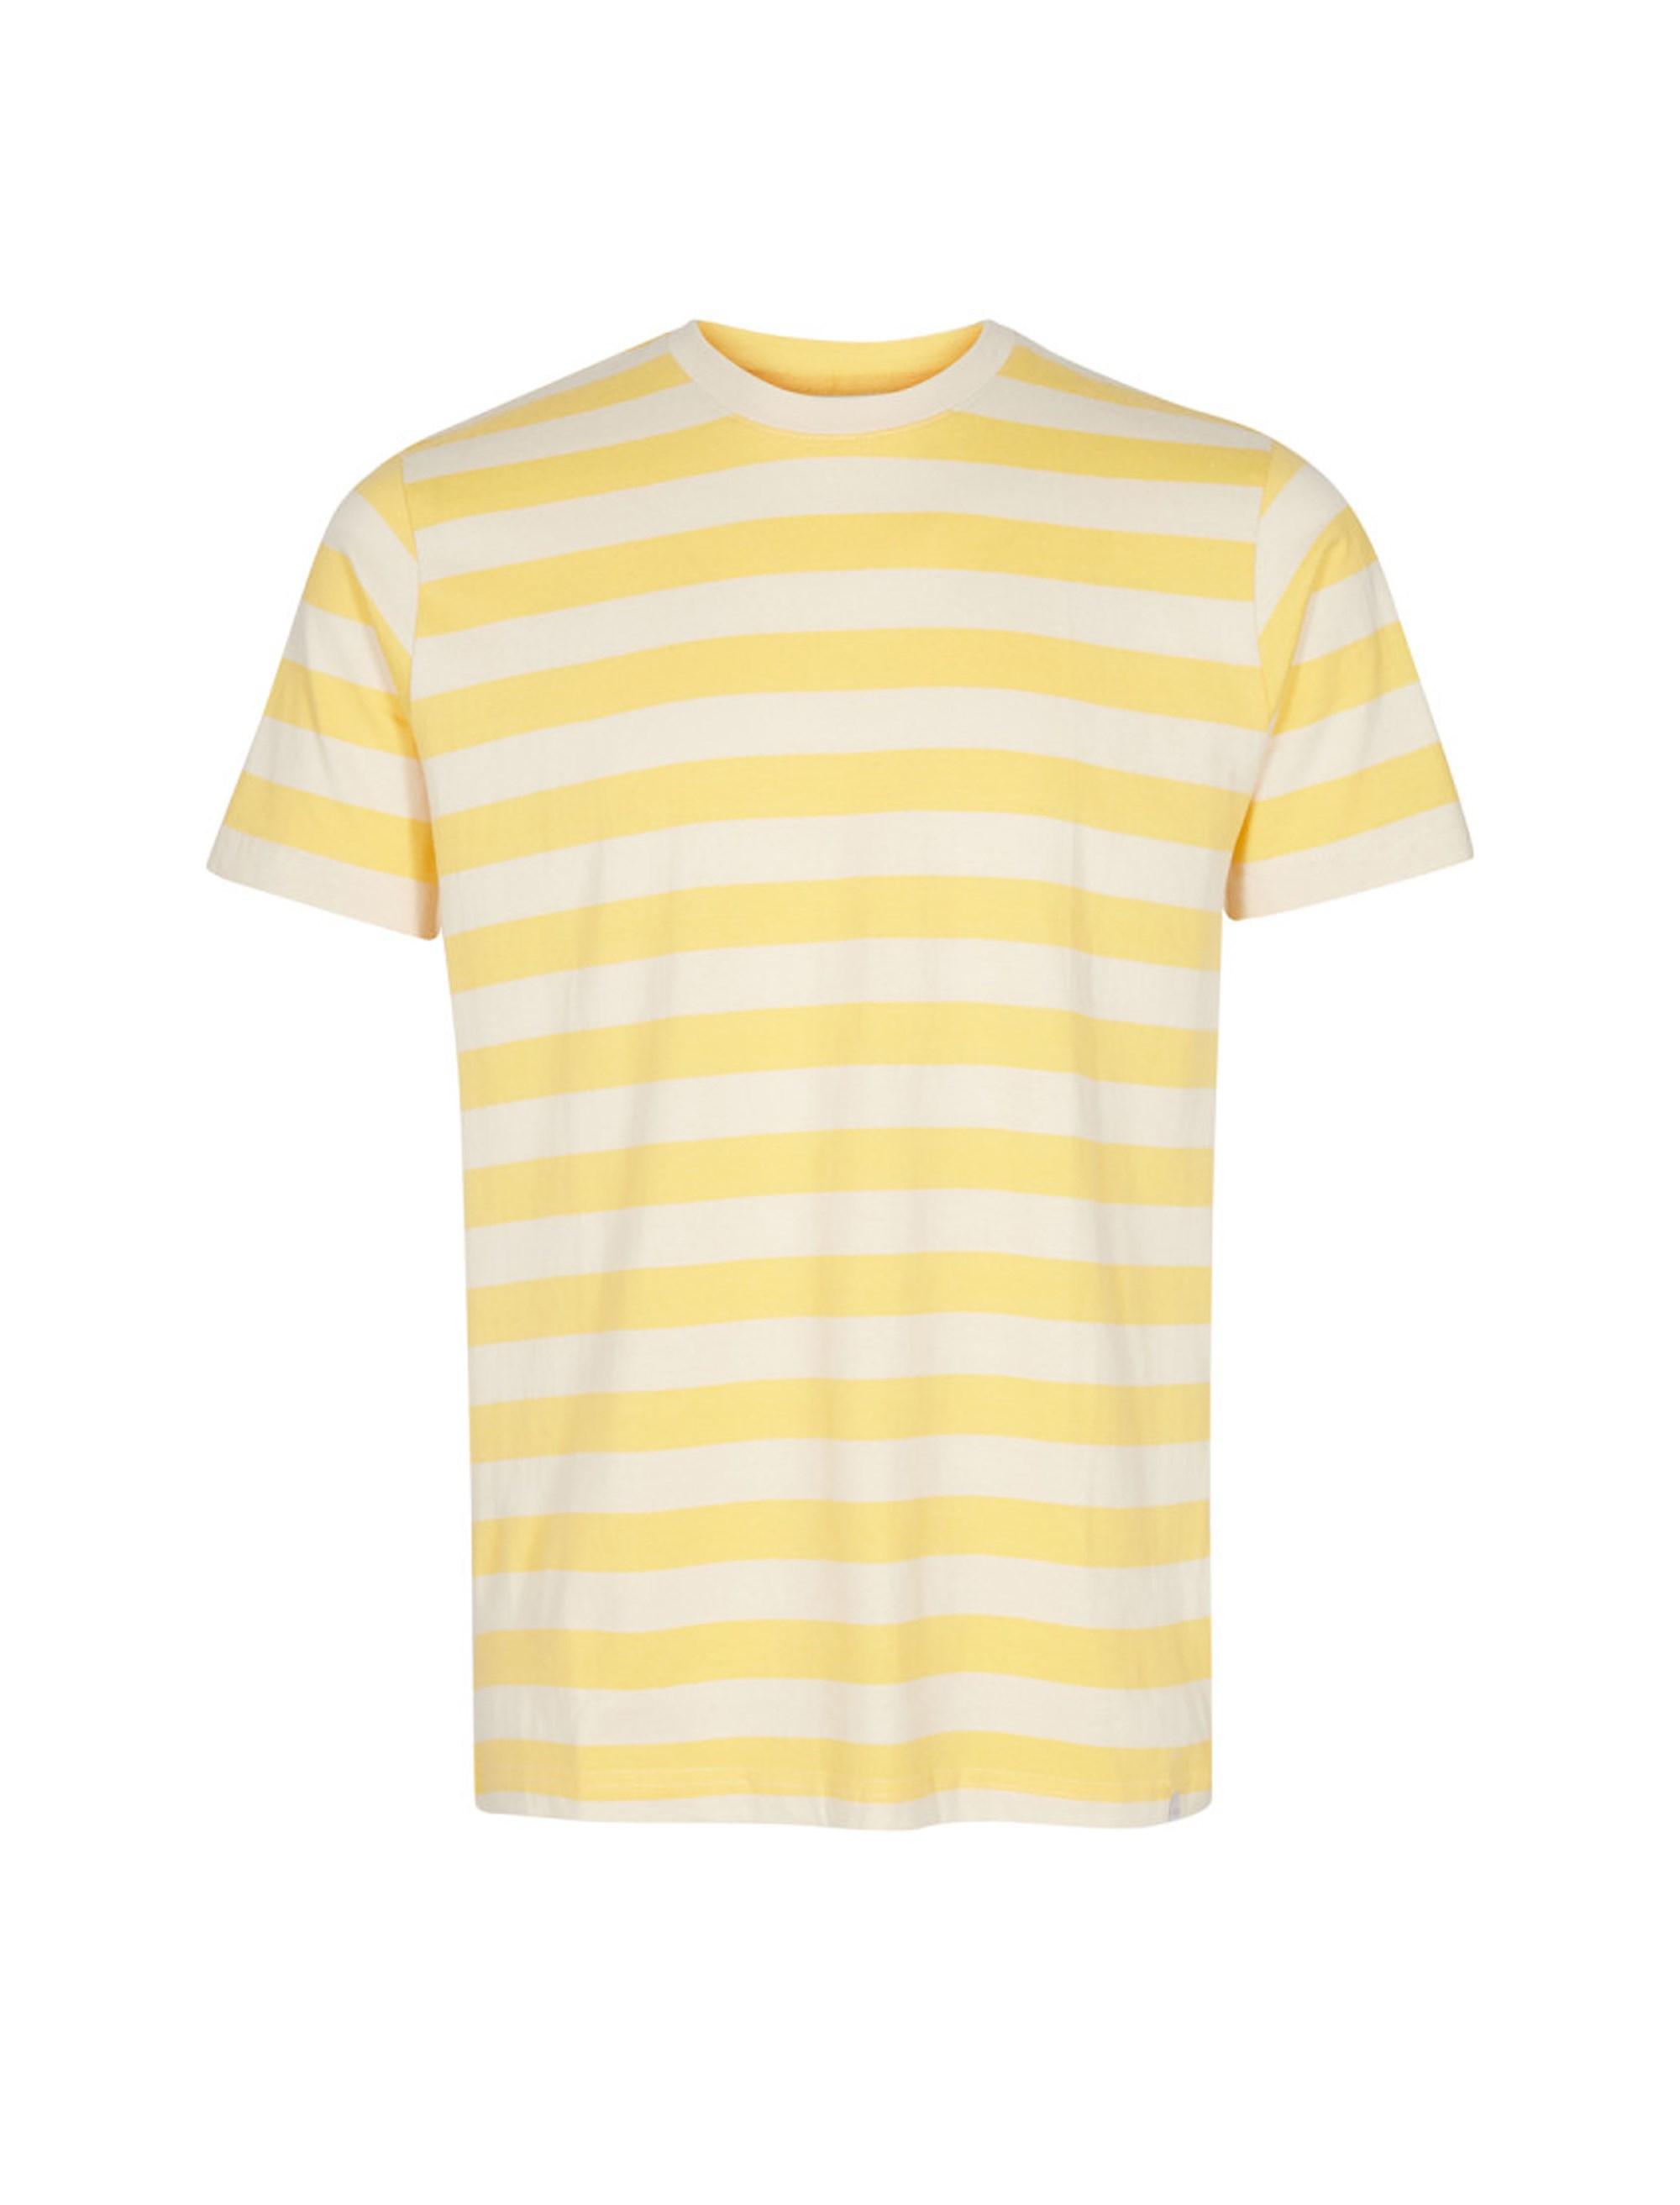 تی شرت نخی مردانه Thiago - مینیموم